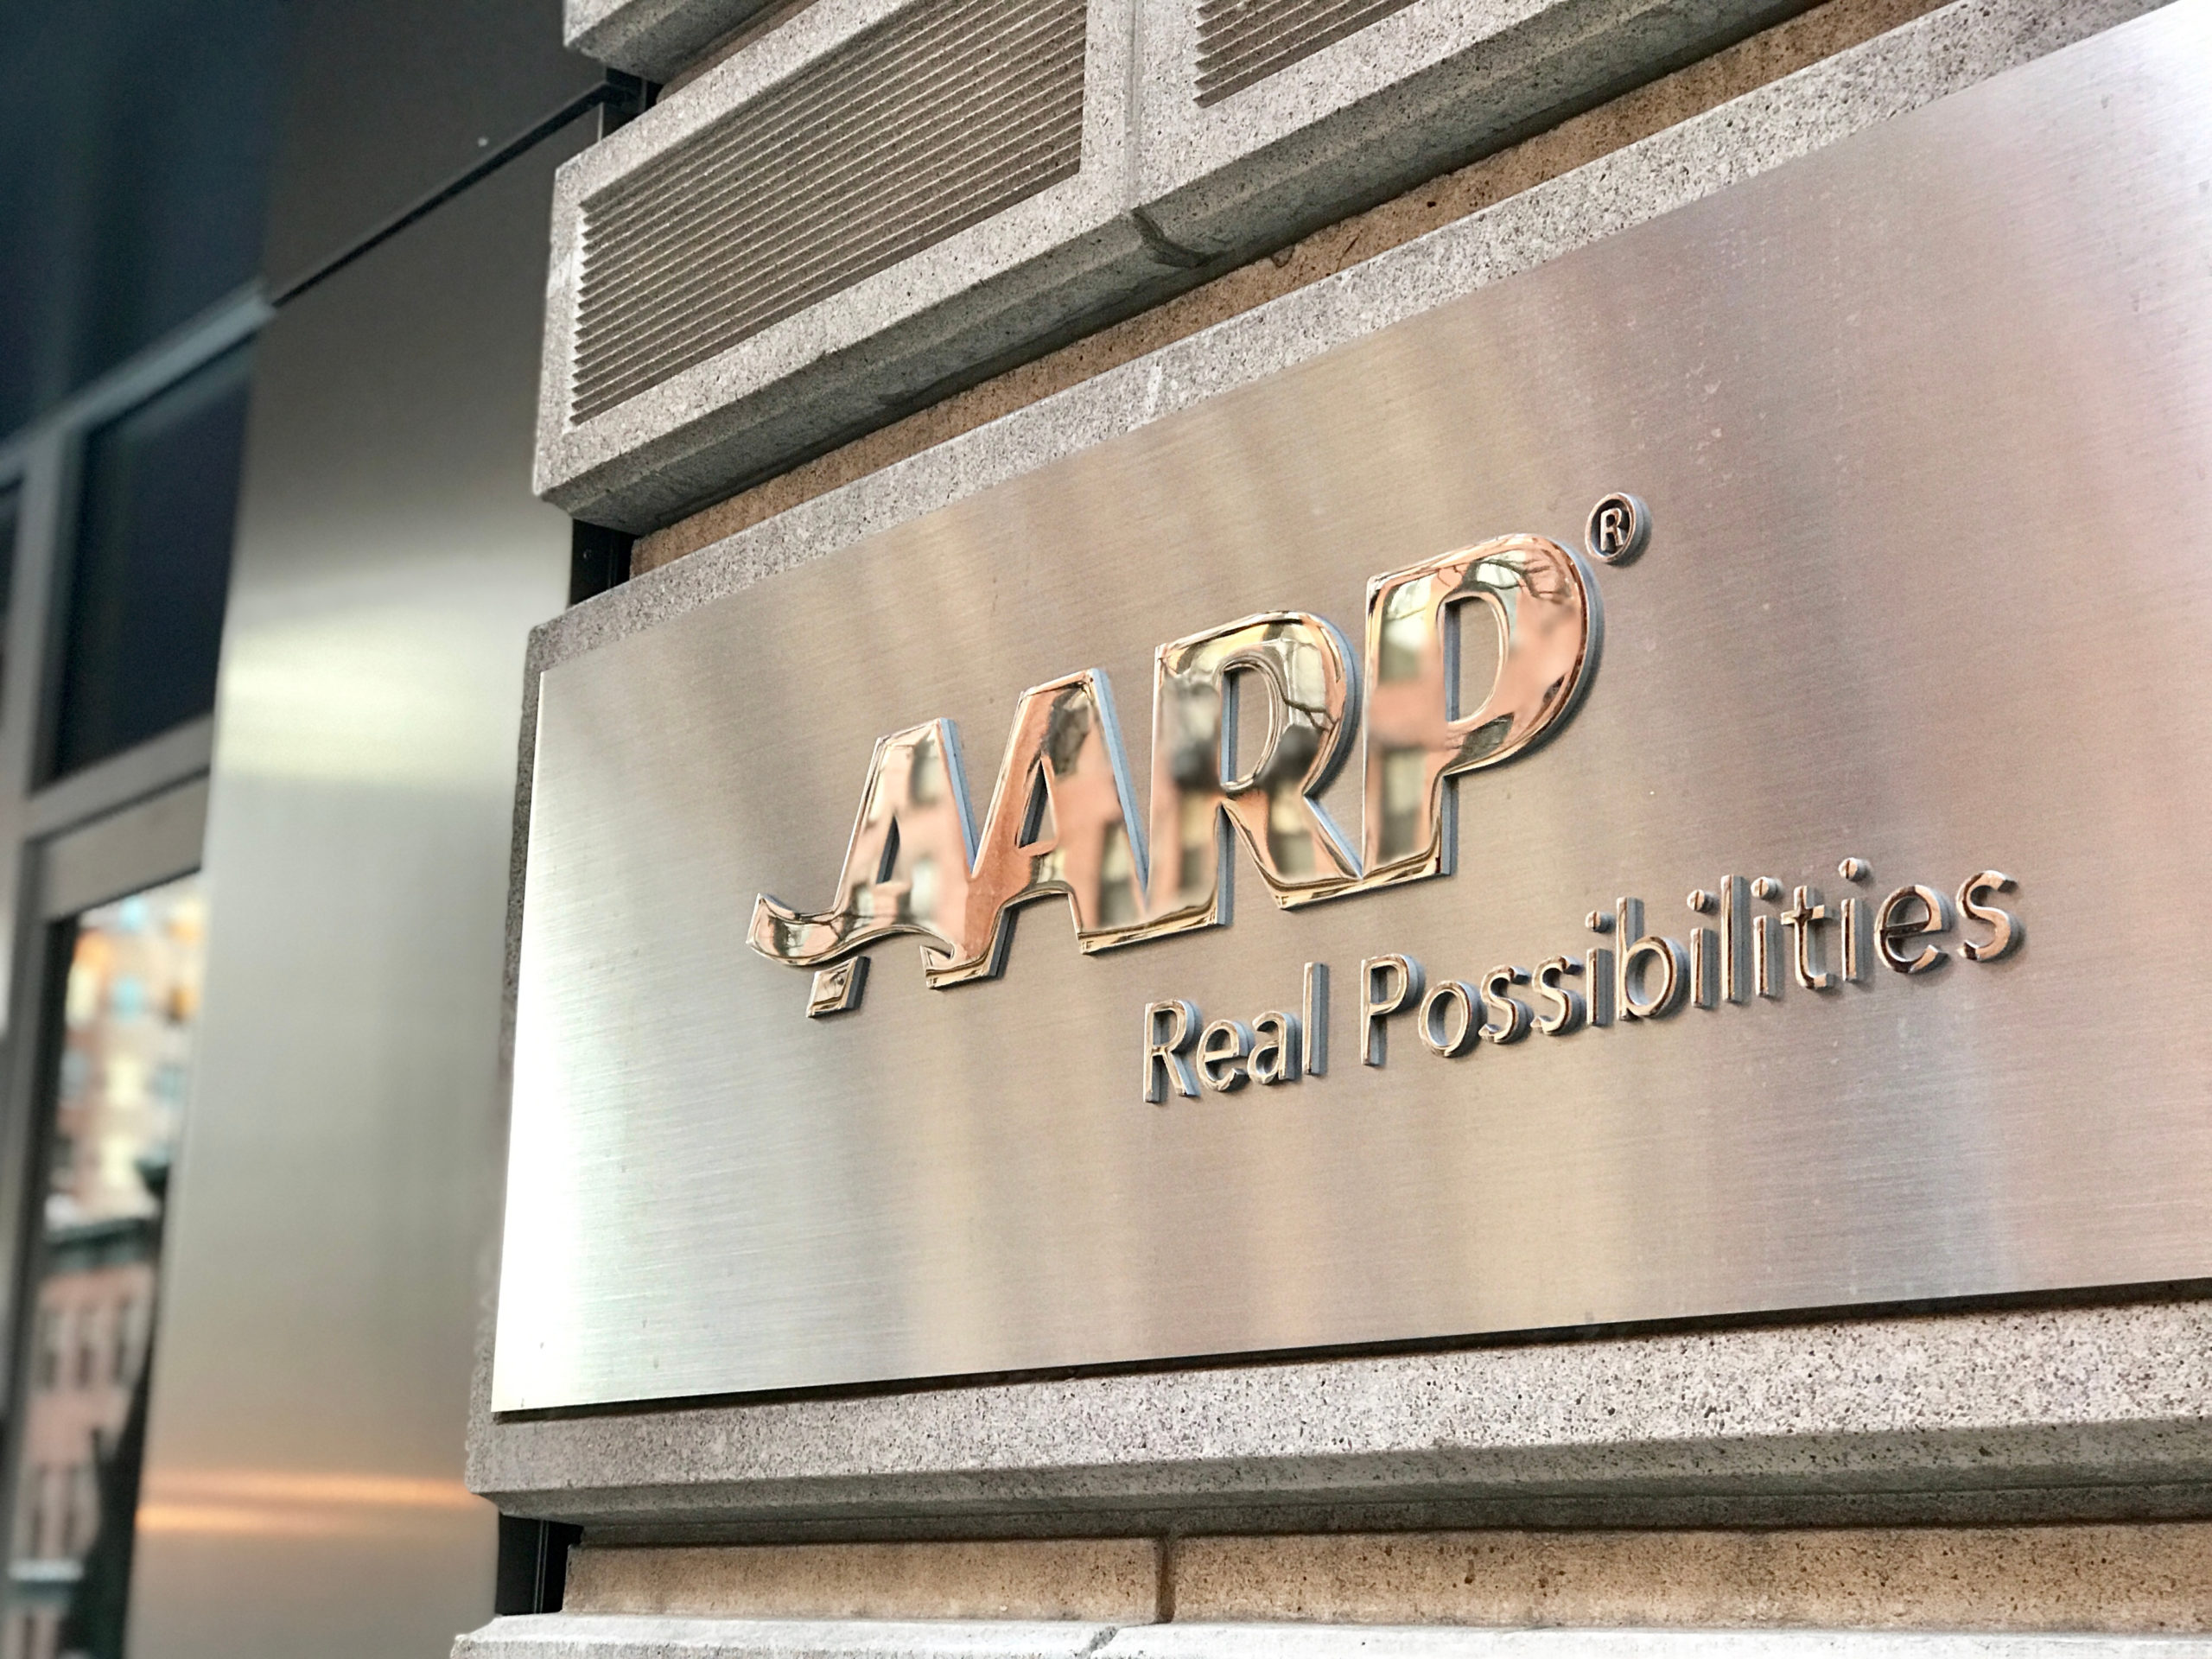 The facade of AARP's Washington D.C. headquarters. (Jer123/Shutterstock)